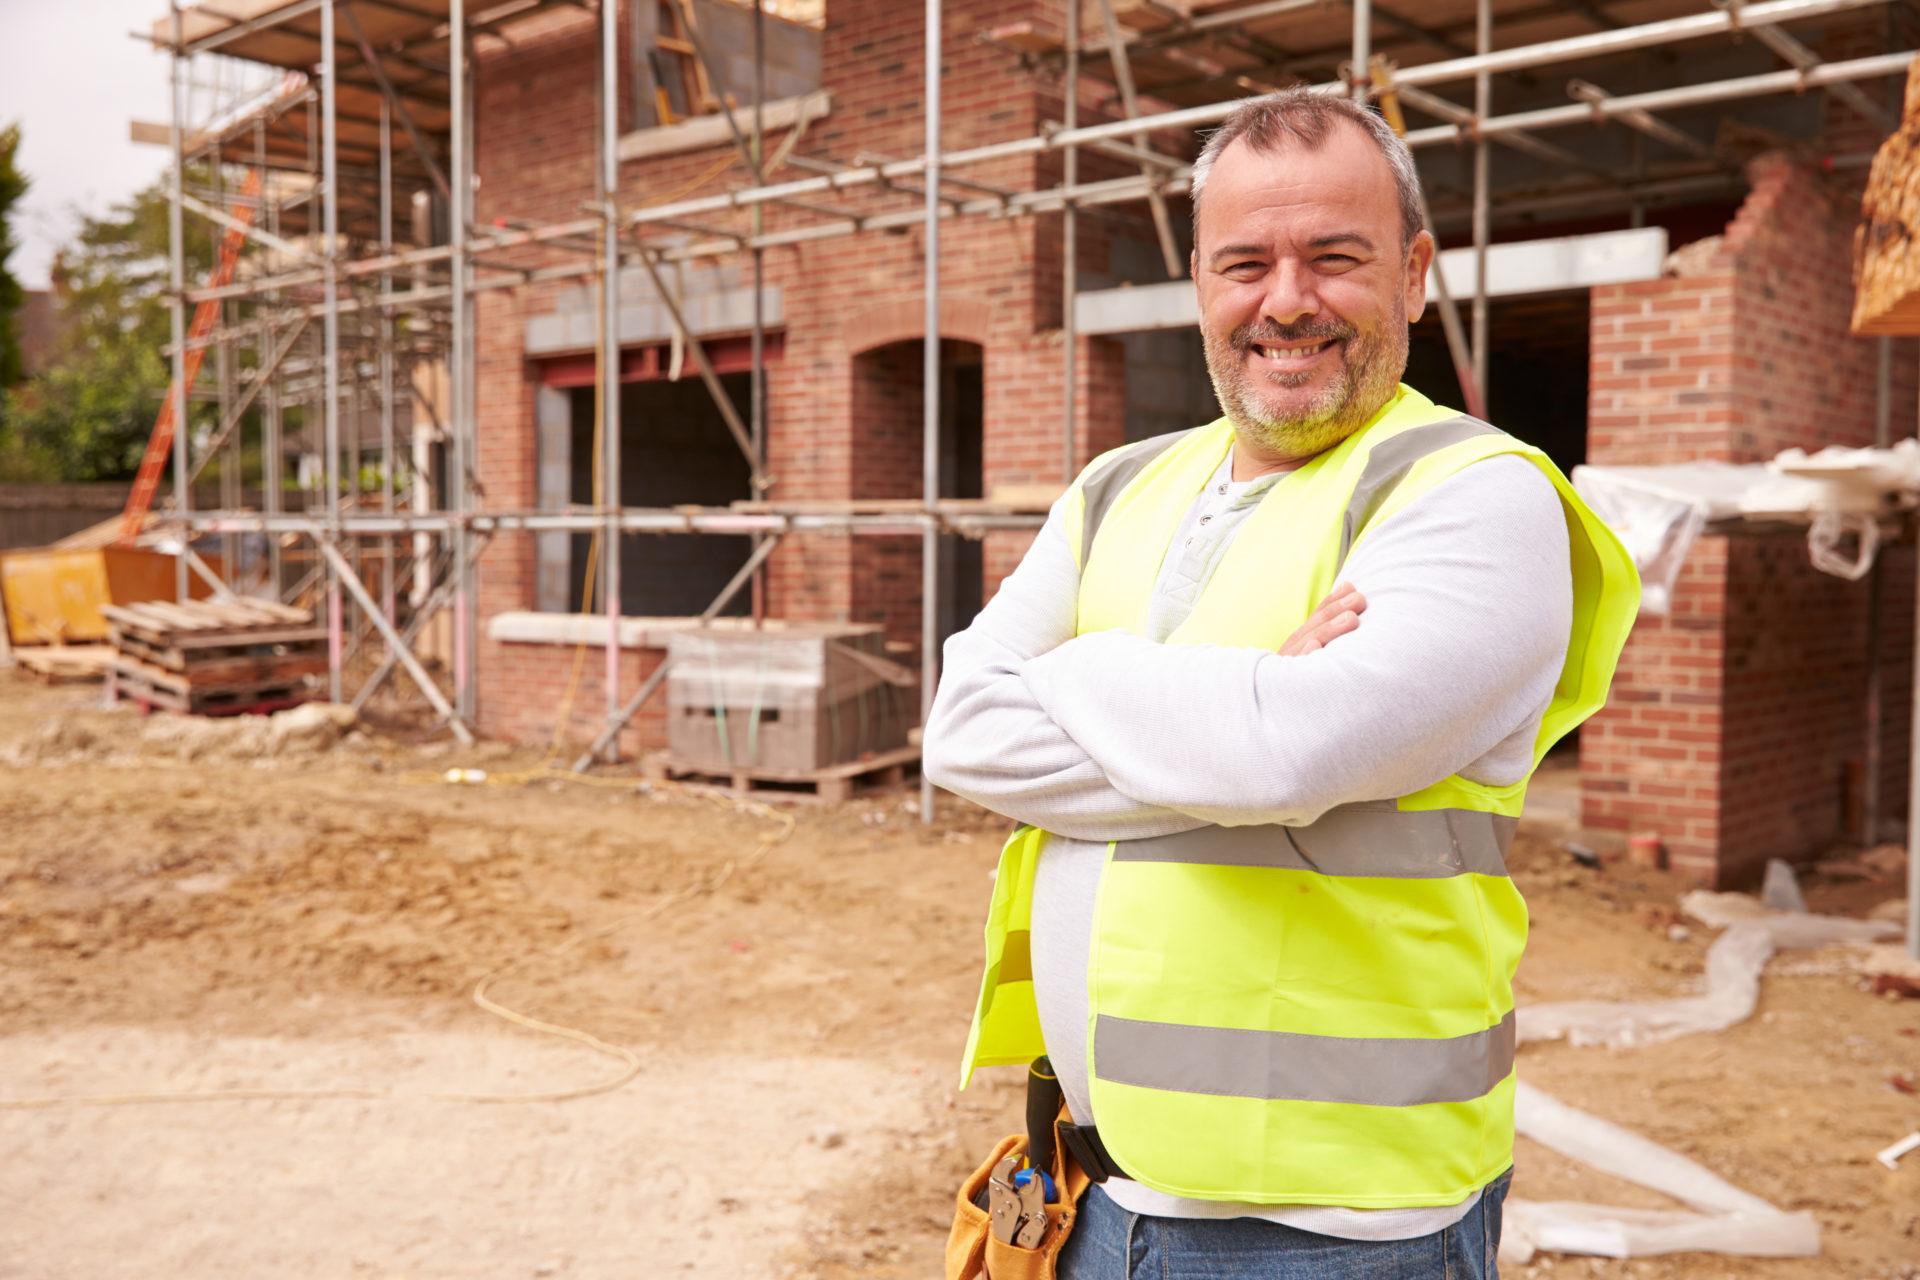 Portrait,Of,Construction,Worker,On,Building,Site